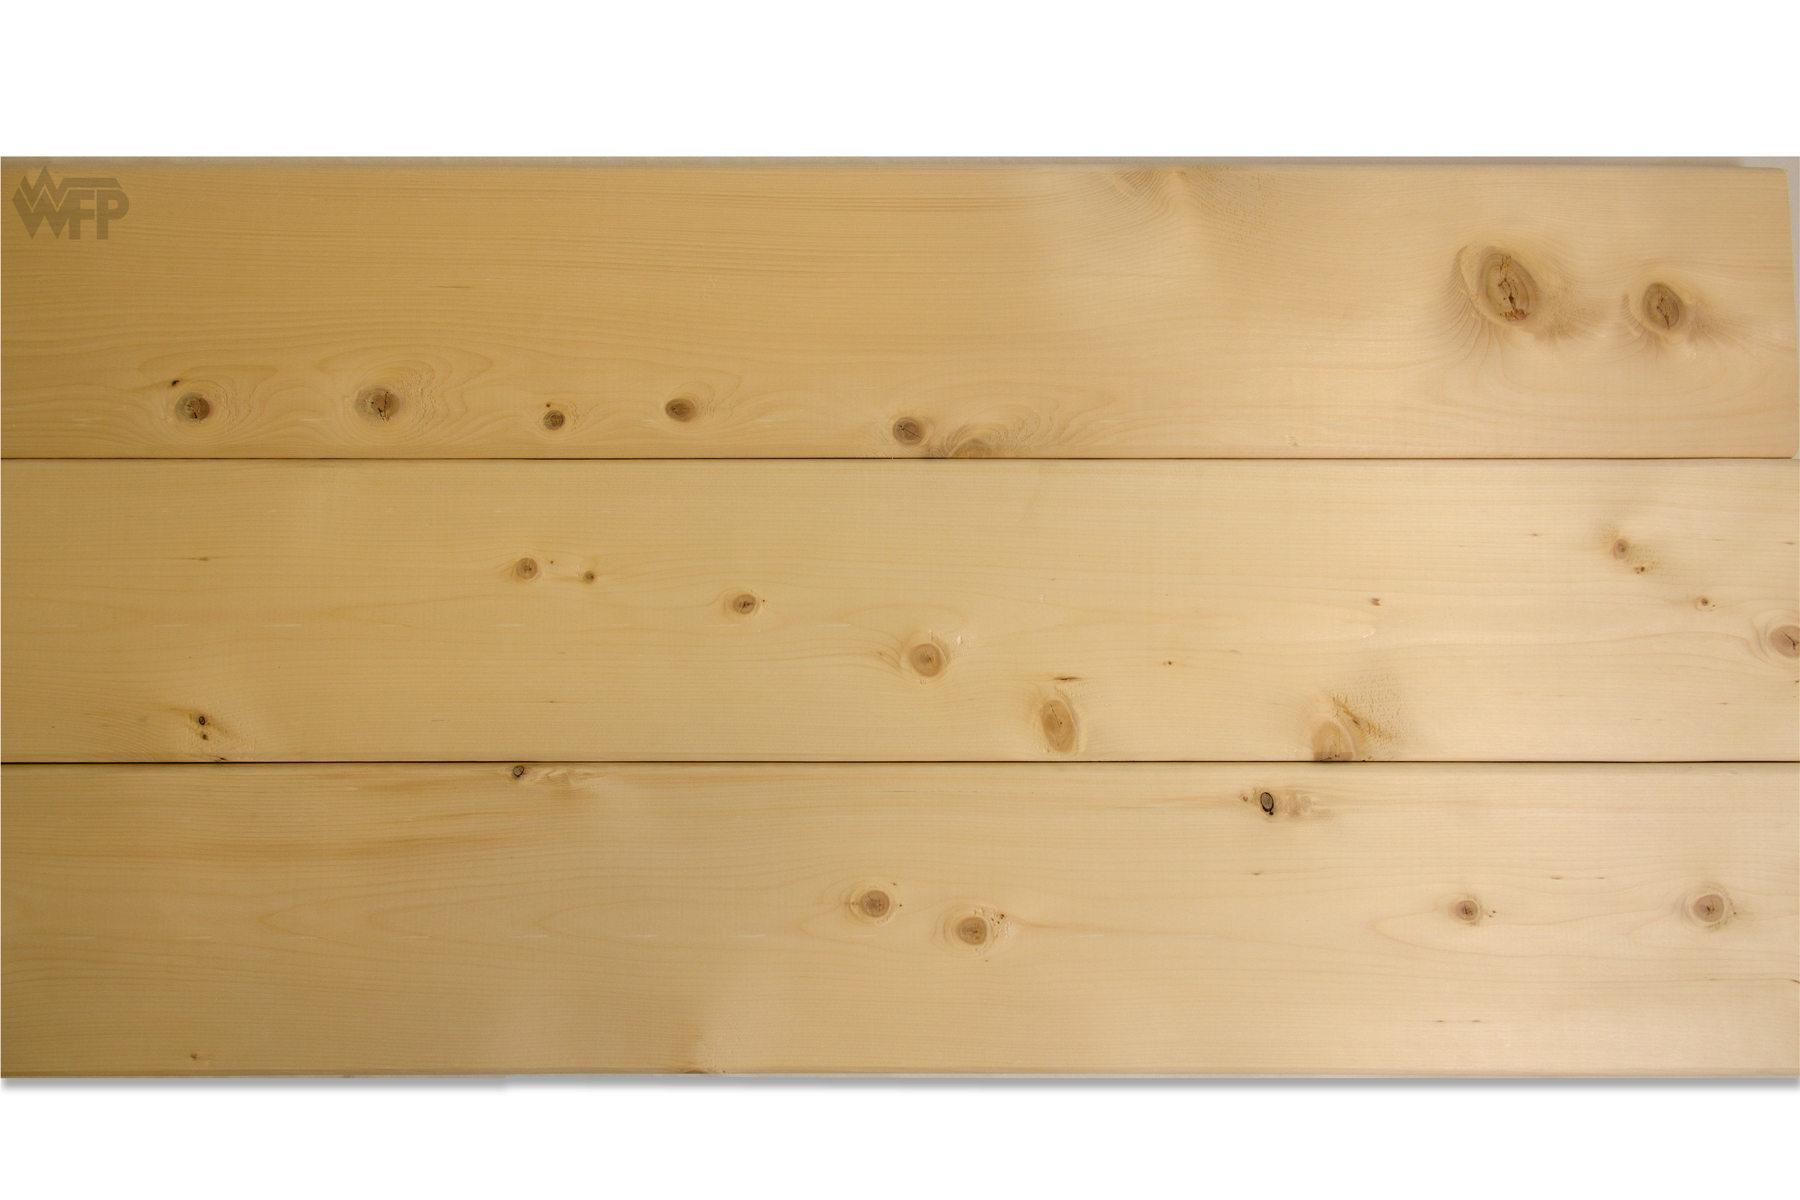 54x6 Knotty Deck - Side by Side